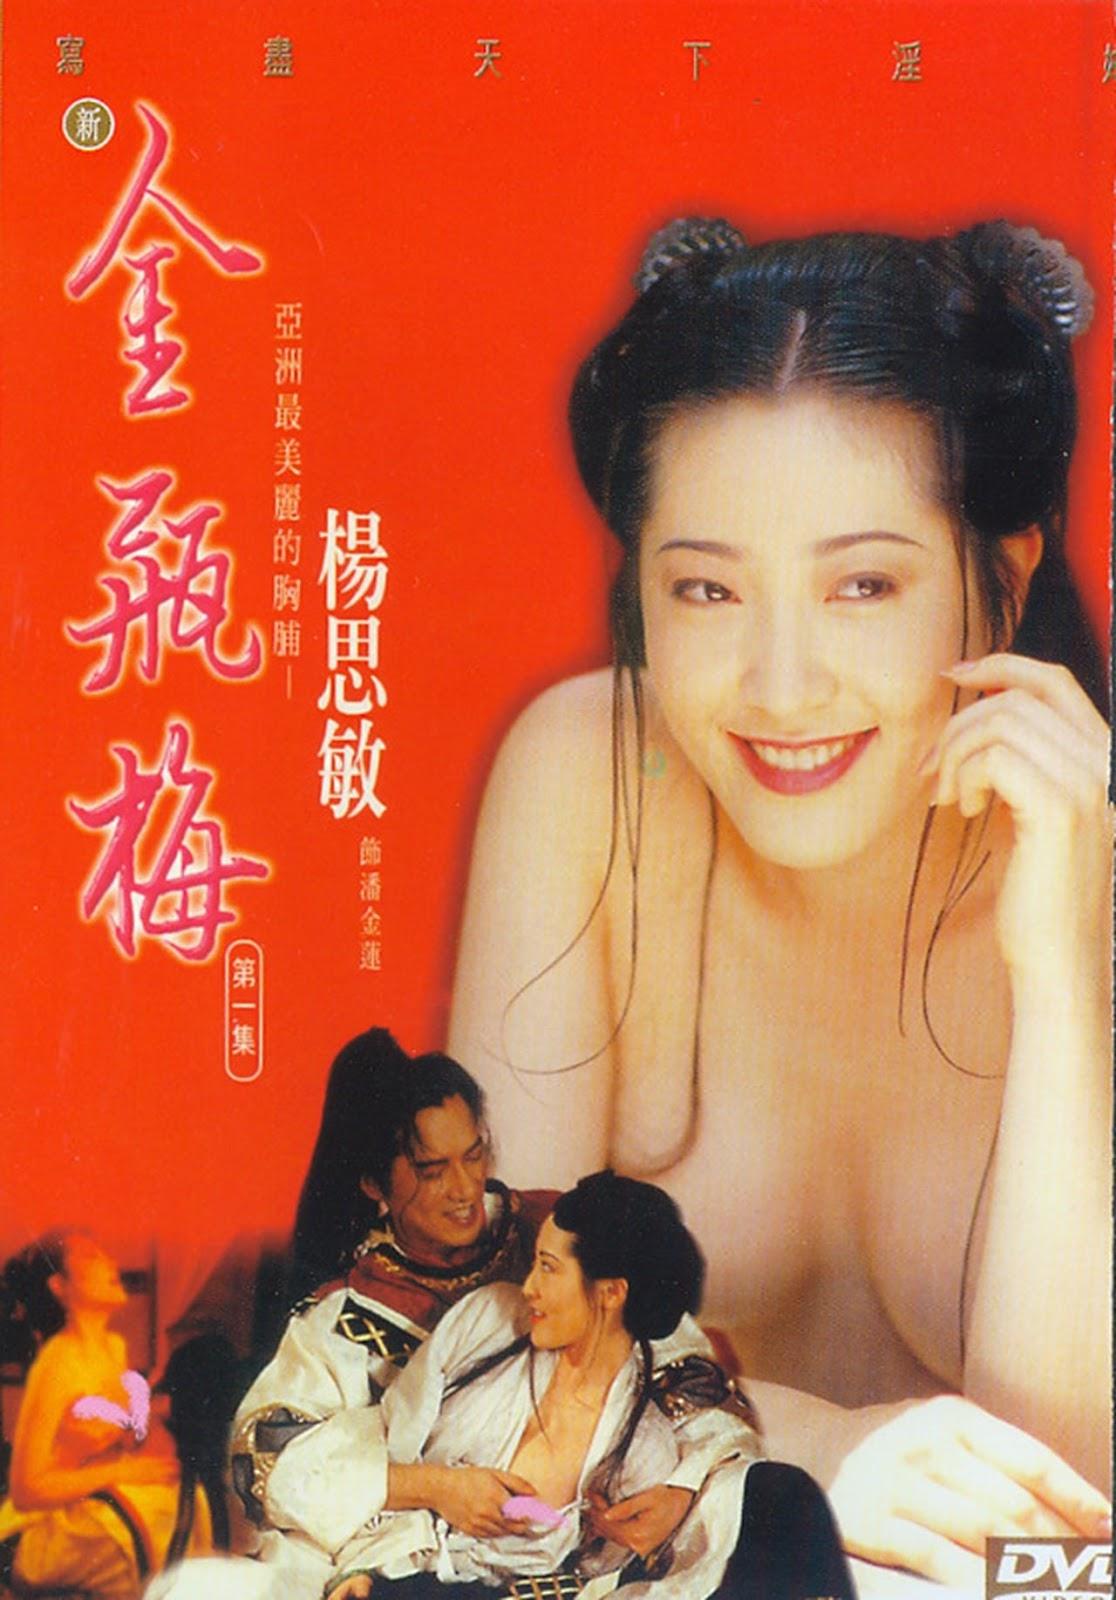 New Jin Ping Mei 1 (Jin Ping Mei) Full CHINA 18+ Watch Movie Online Free